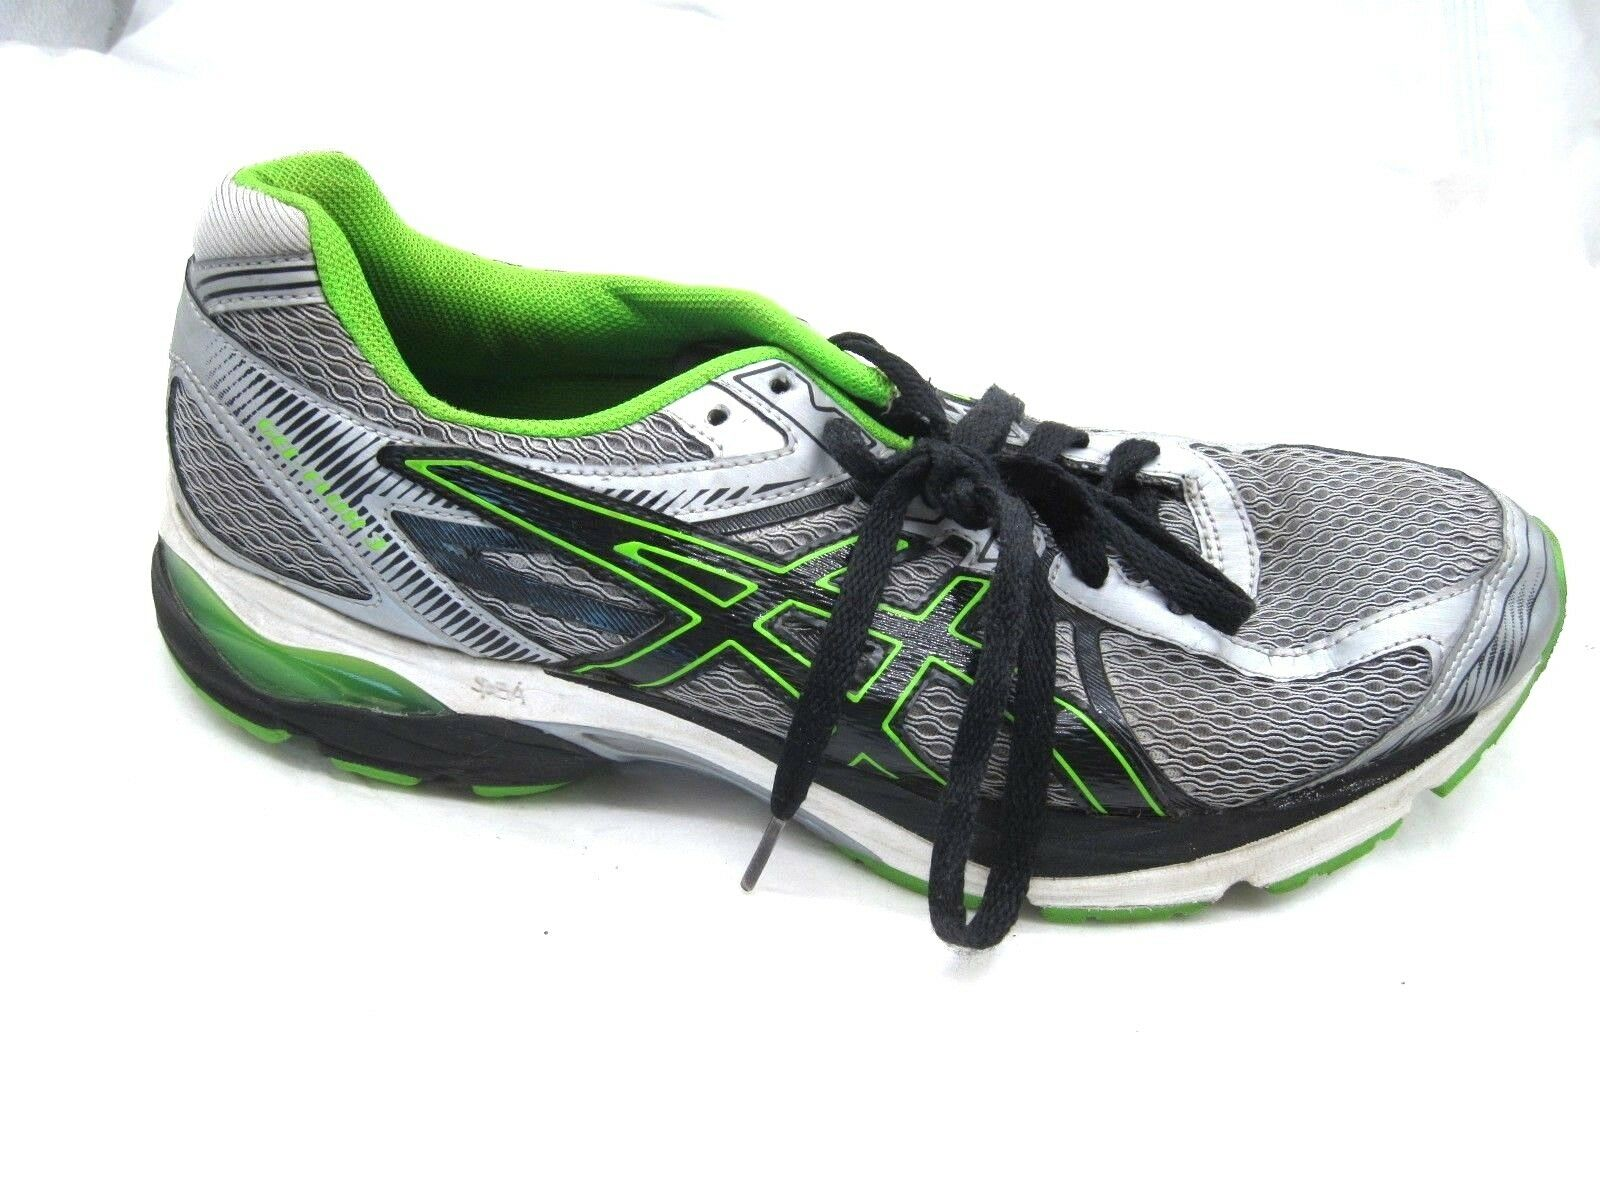 Asics Gel-Flux 3 silver black running mens tennis athletic shoes sz 10M T614N